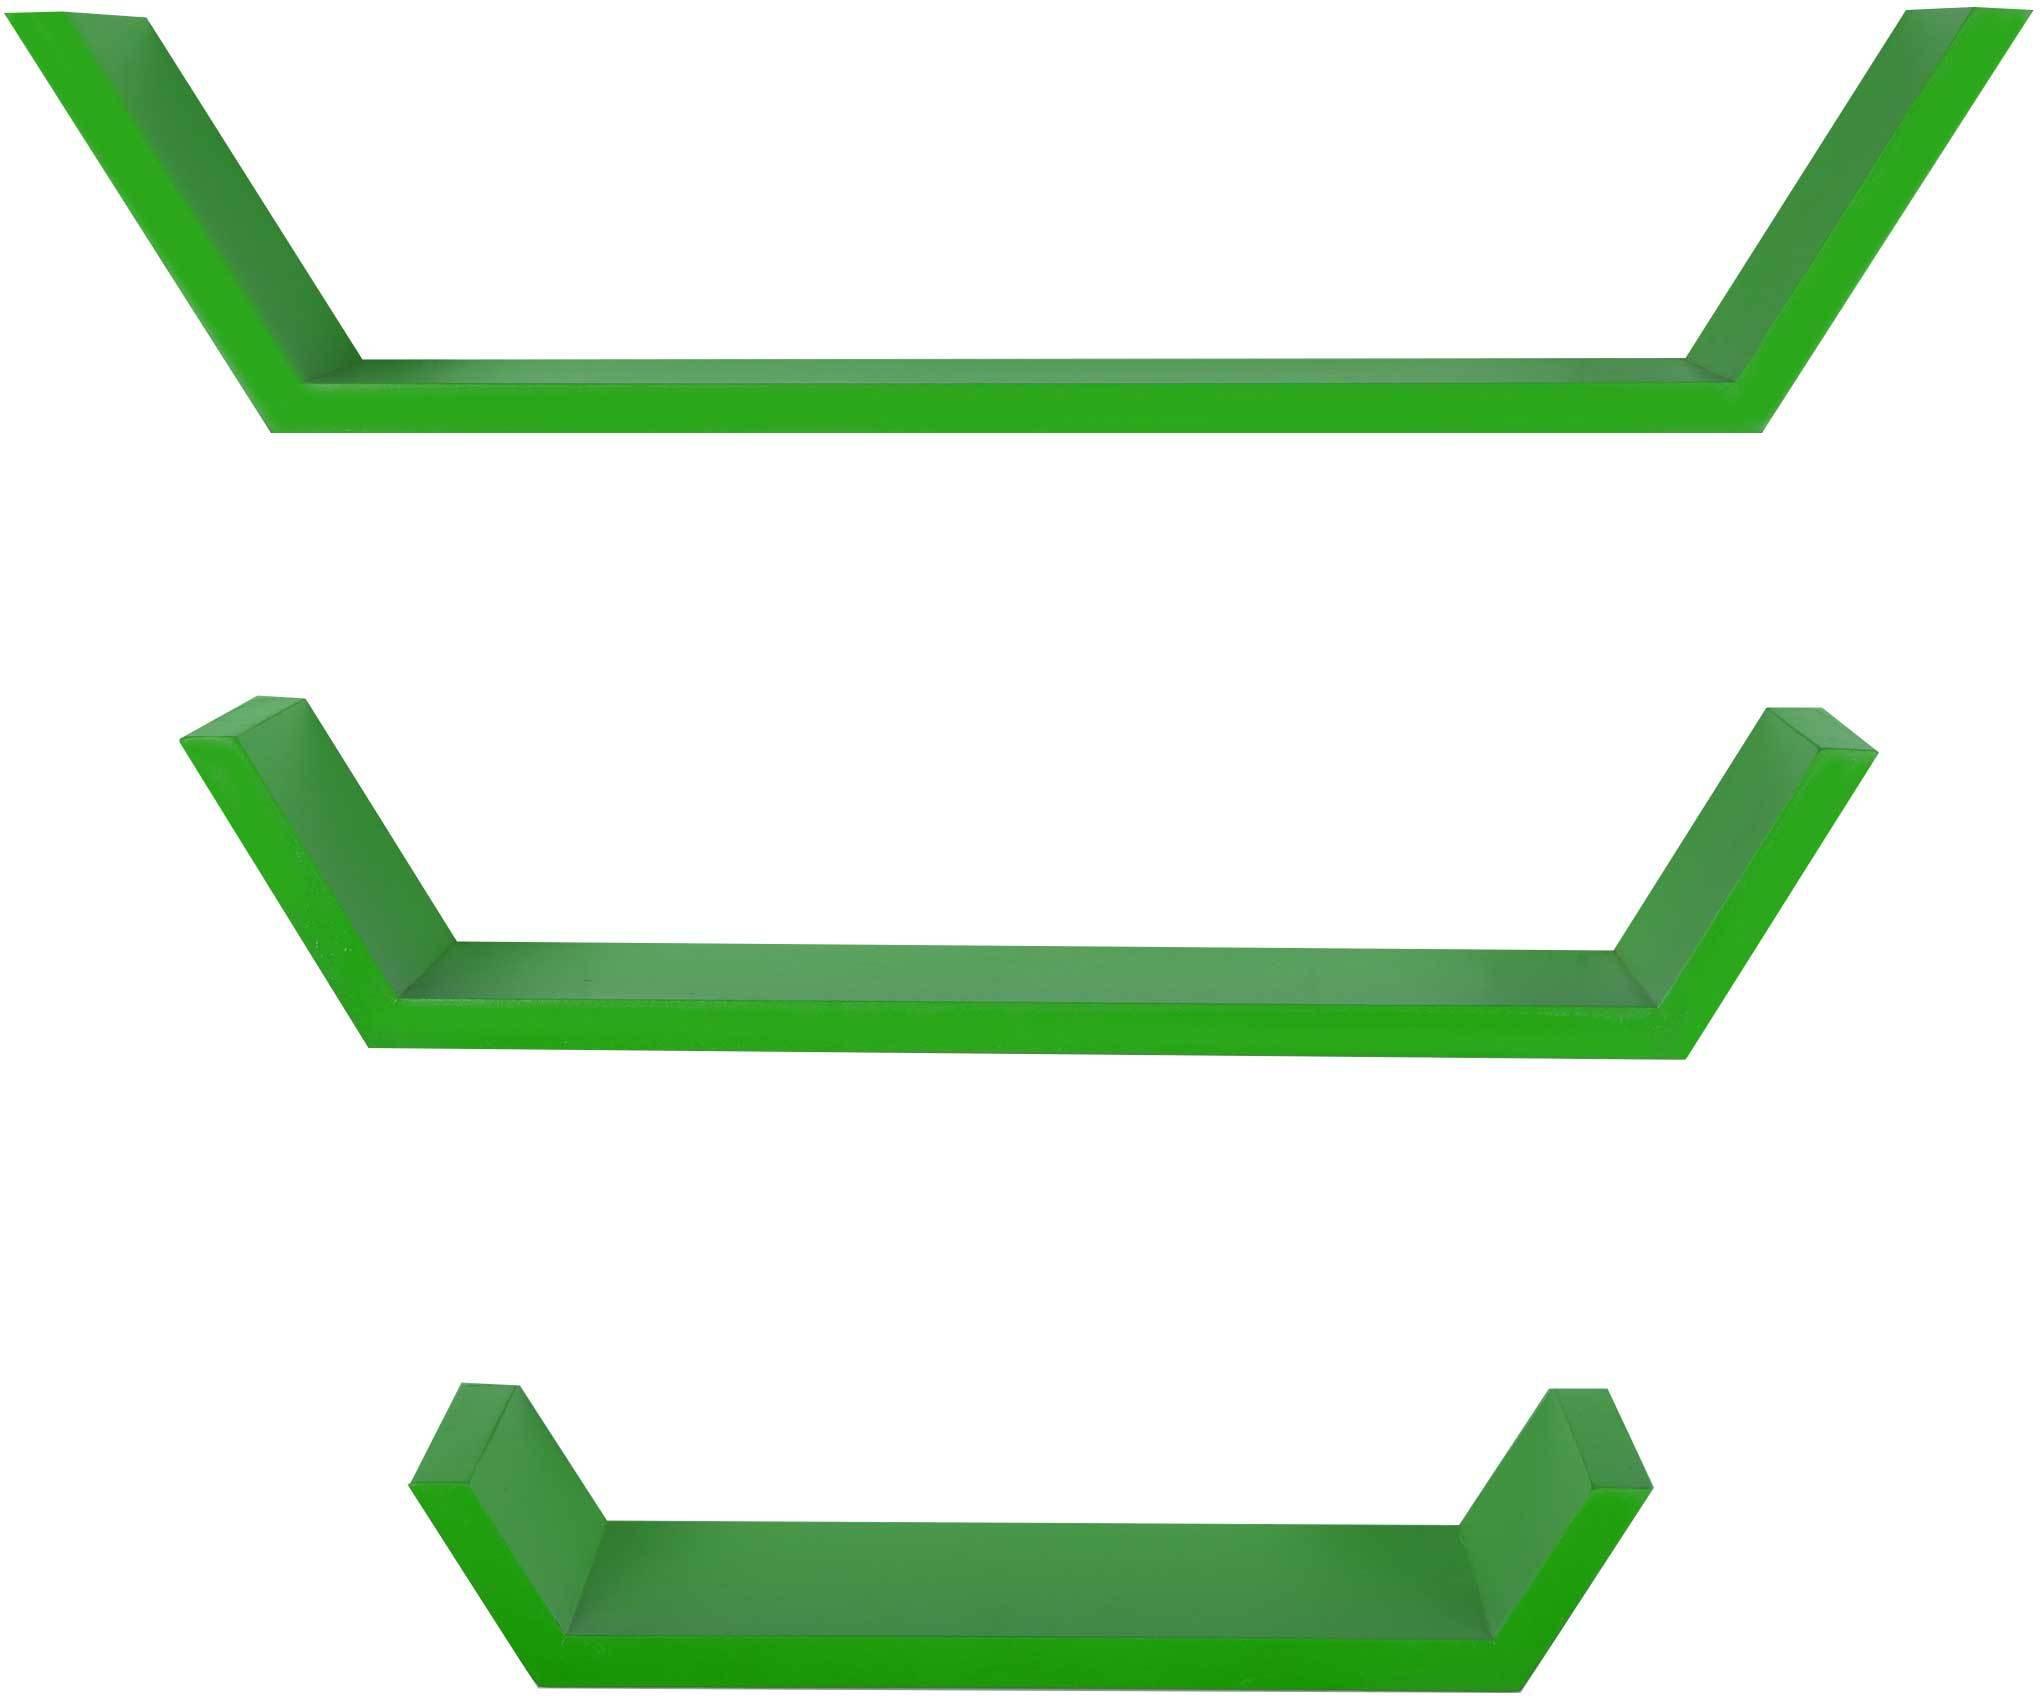 View Dcjc Dcjc Floater Boat Shelf Green - Set Of 3 MDF Wall Shelf(Number of Shelves - 3, Green) Furniture (Dcjc)